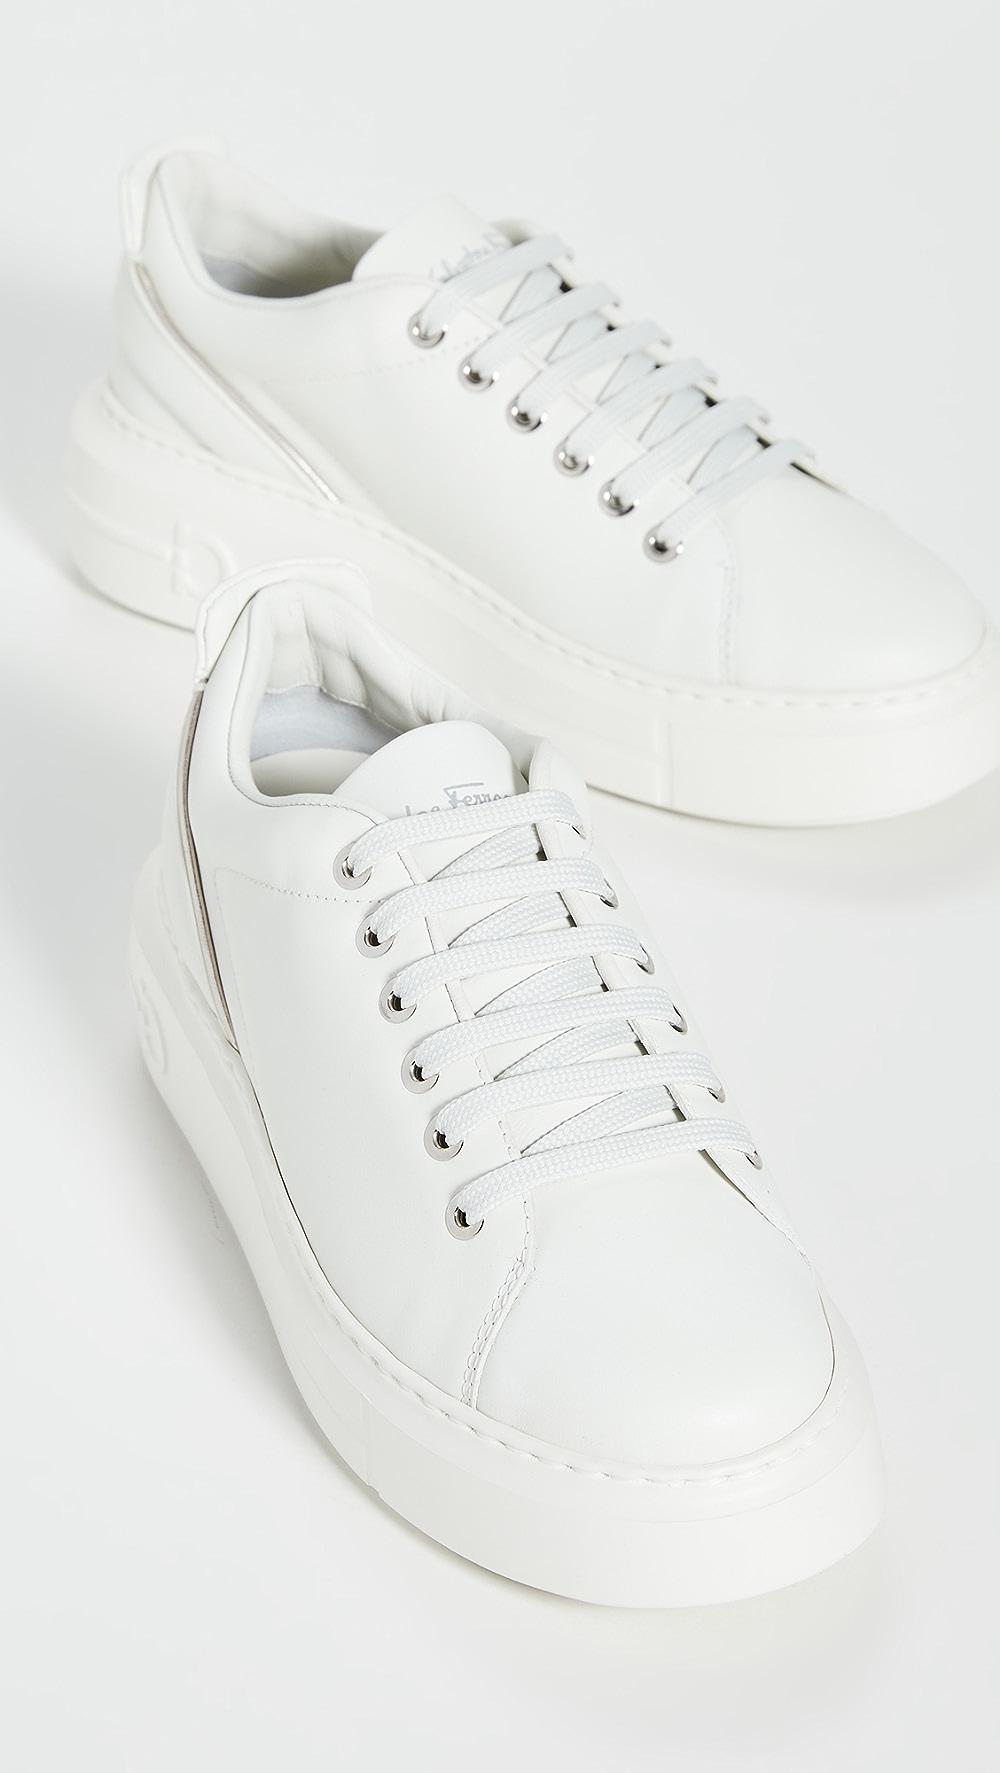 Amiable Salvatore Ferragamo - Senise Sneakers Convenience Goods